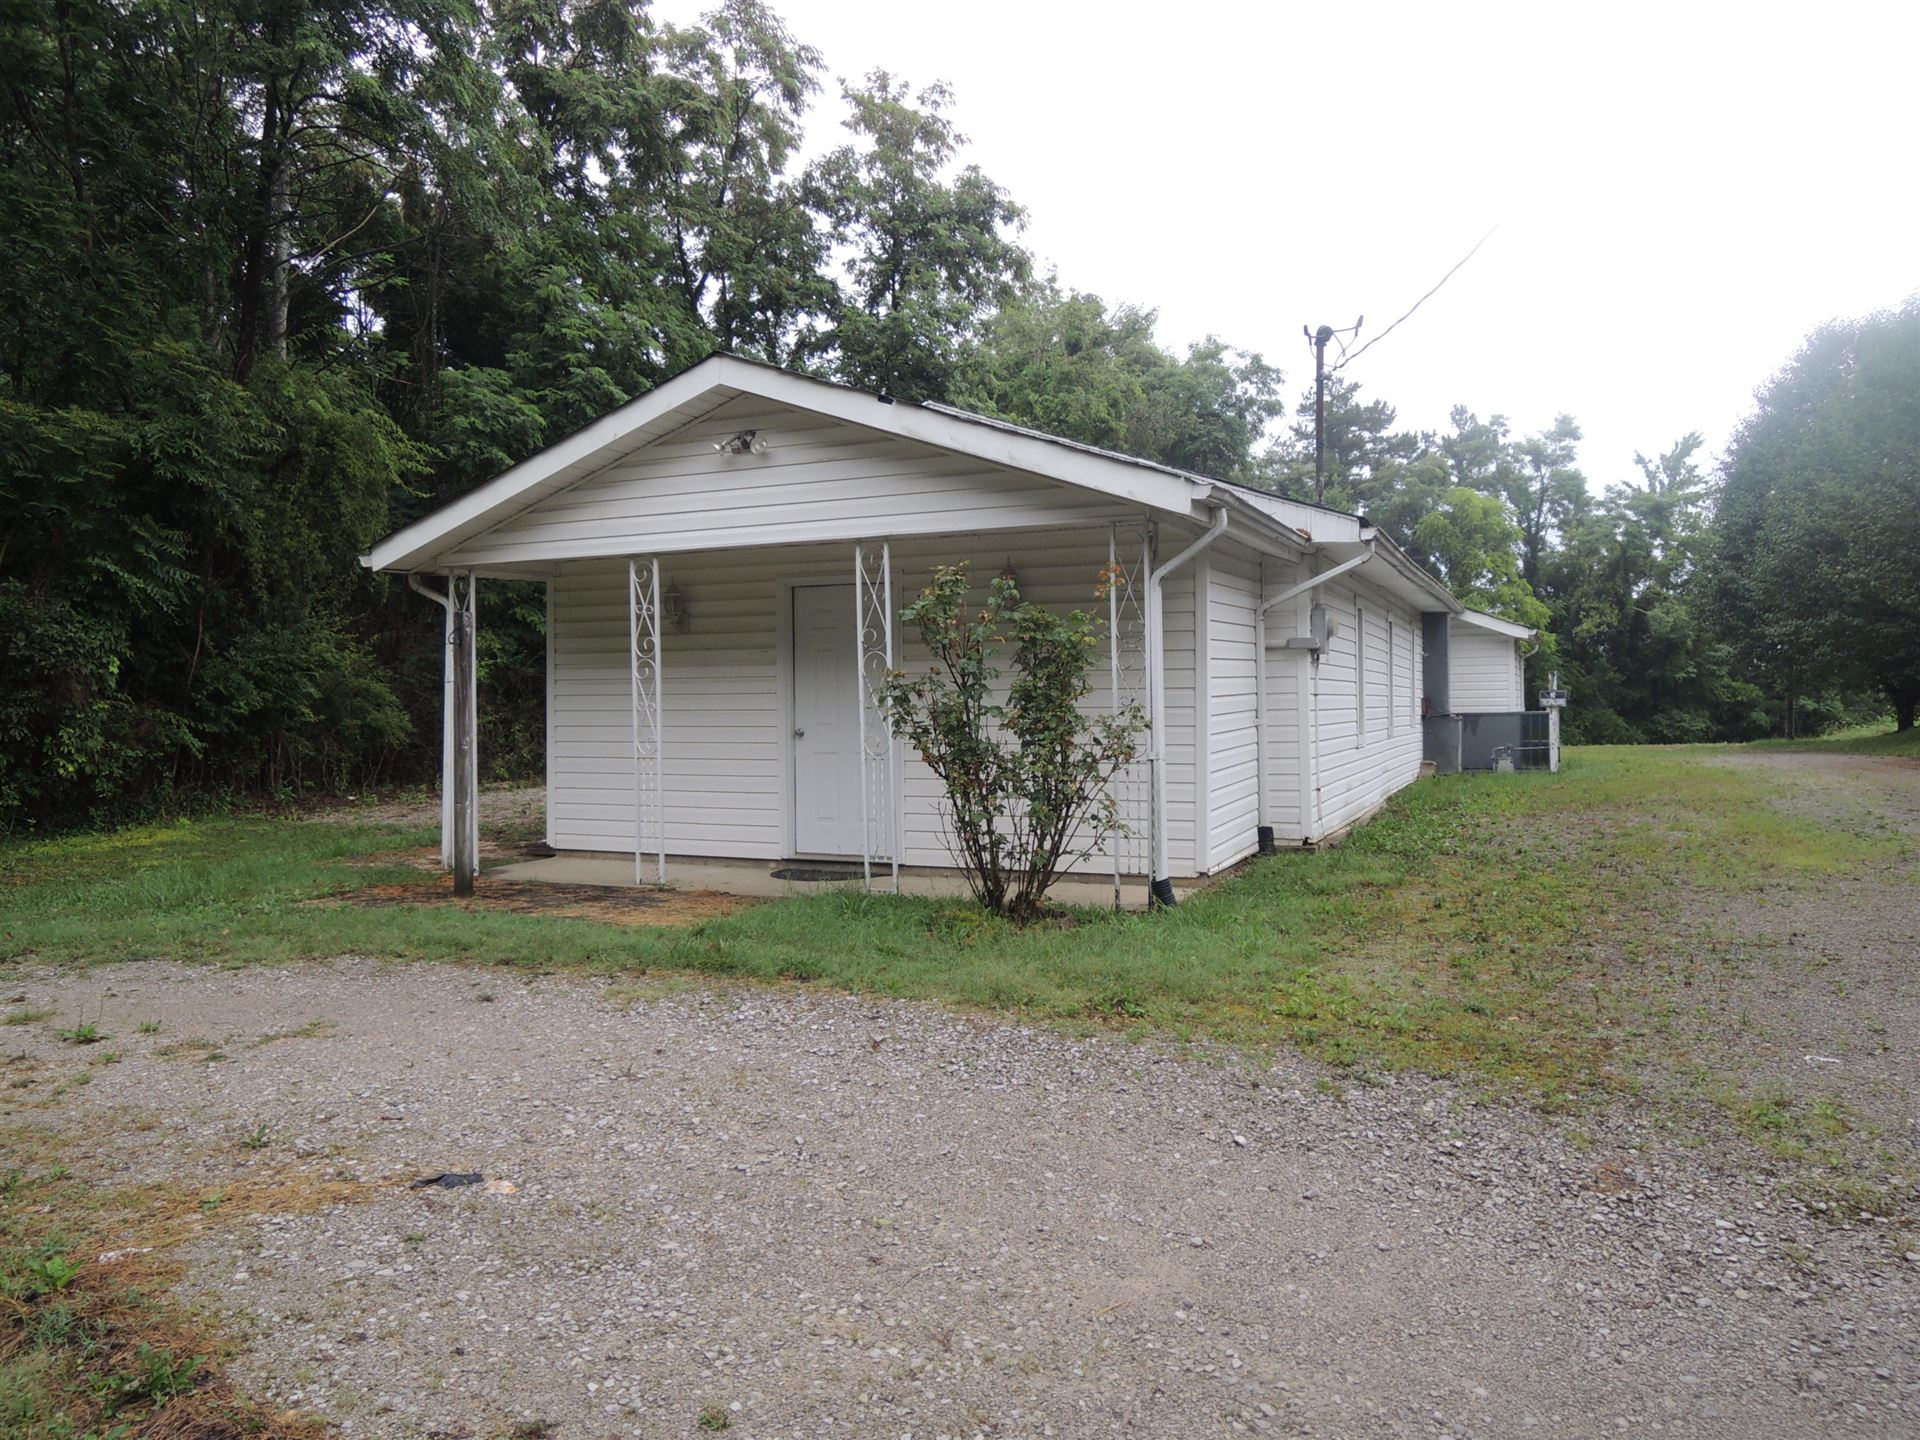 Photo of 1139 Pickett Park Hwy Hwy, Jamestown, TN 38556 (MLS # 1158789)